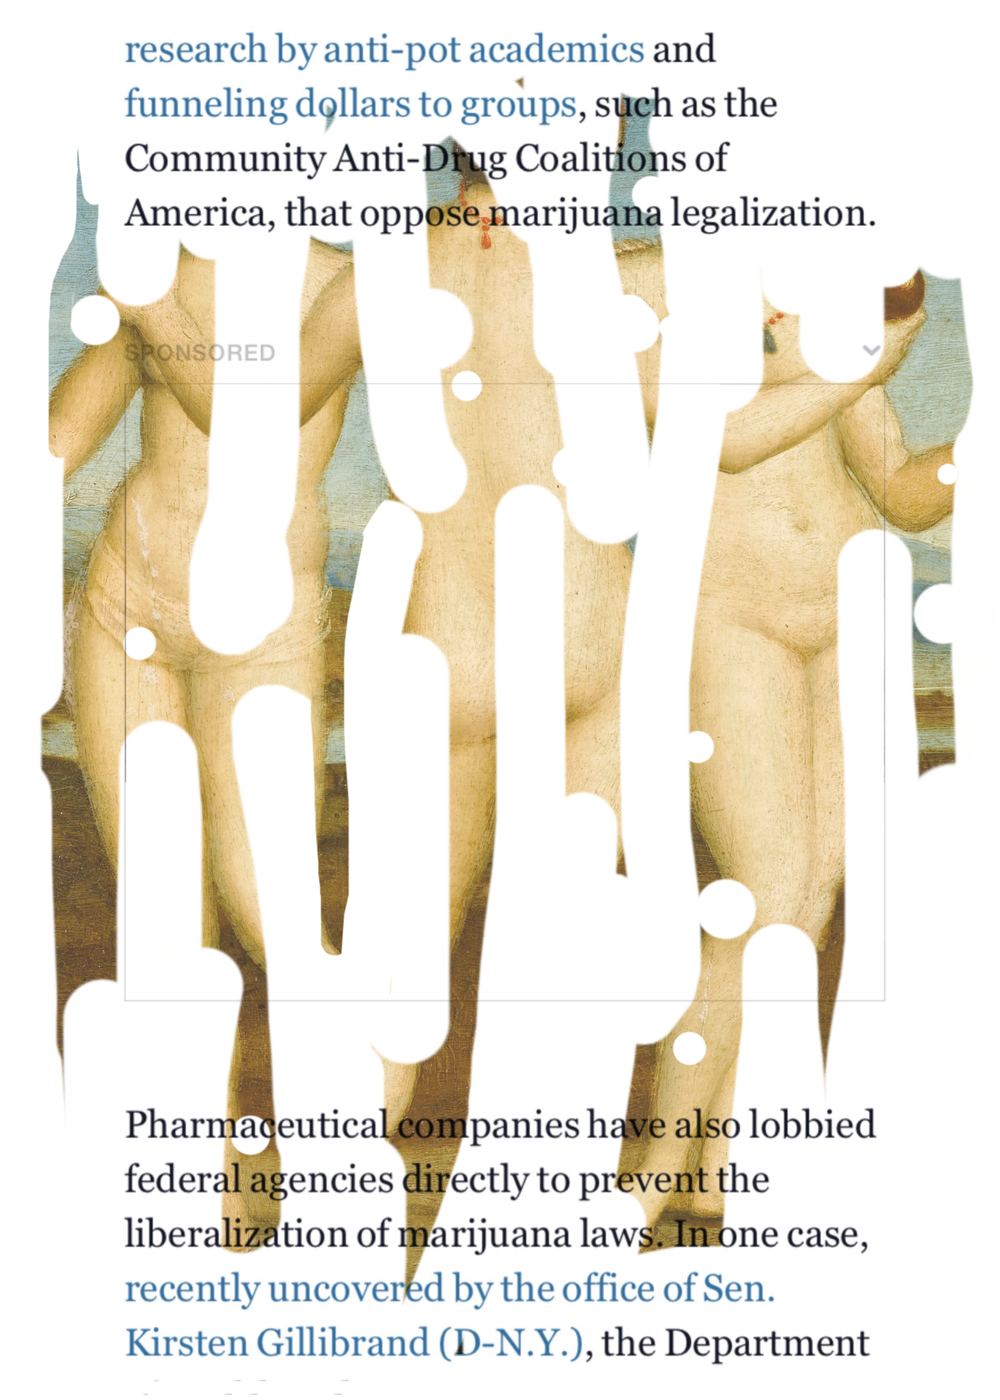 """The Liberalization of Marijuana Laws"", iPhone 6S, digital image."